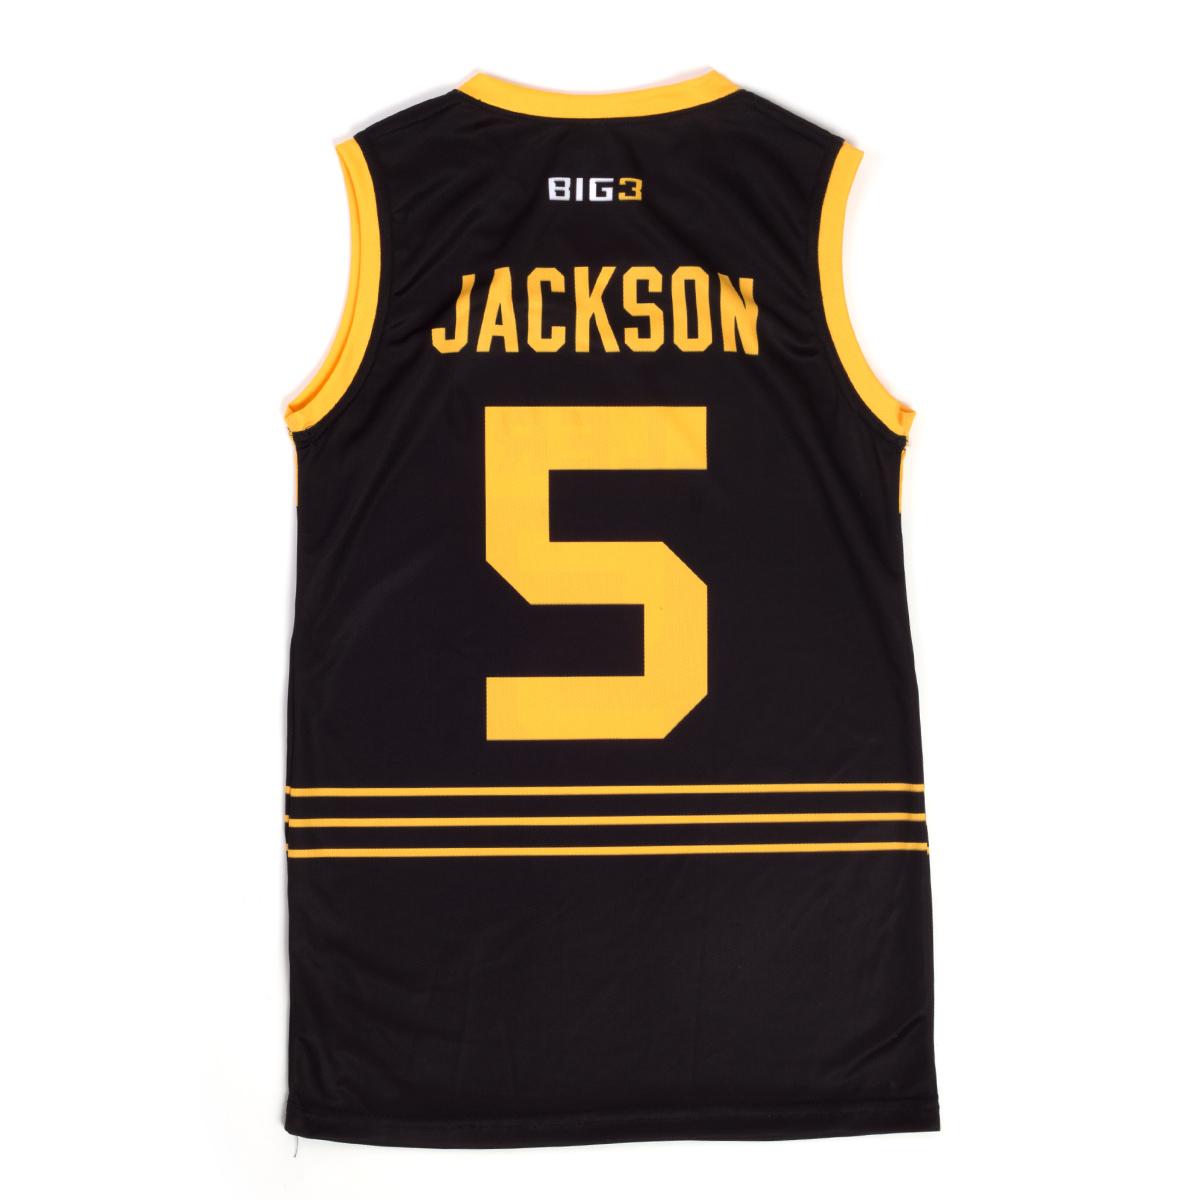 S.Jackson Jersey